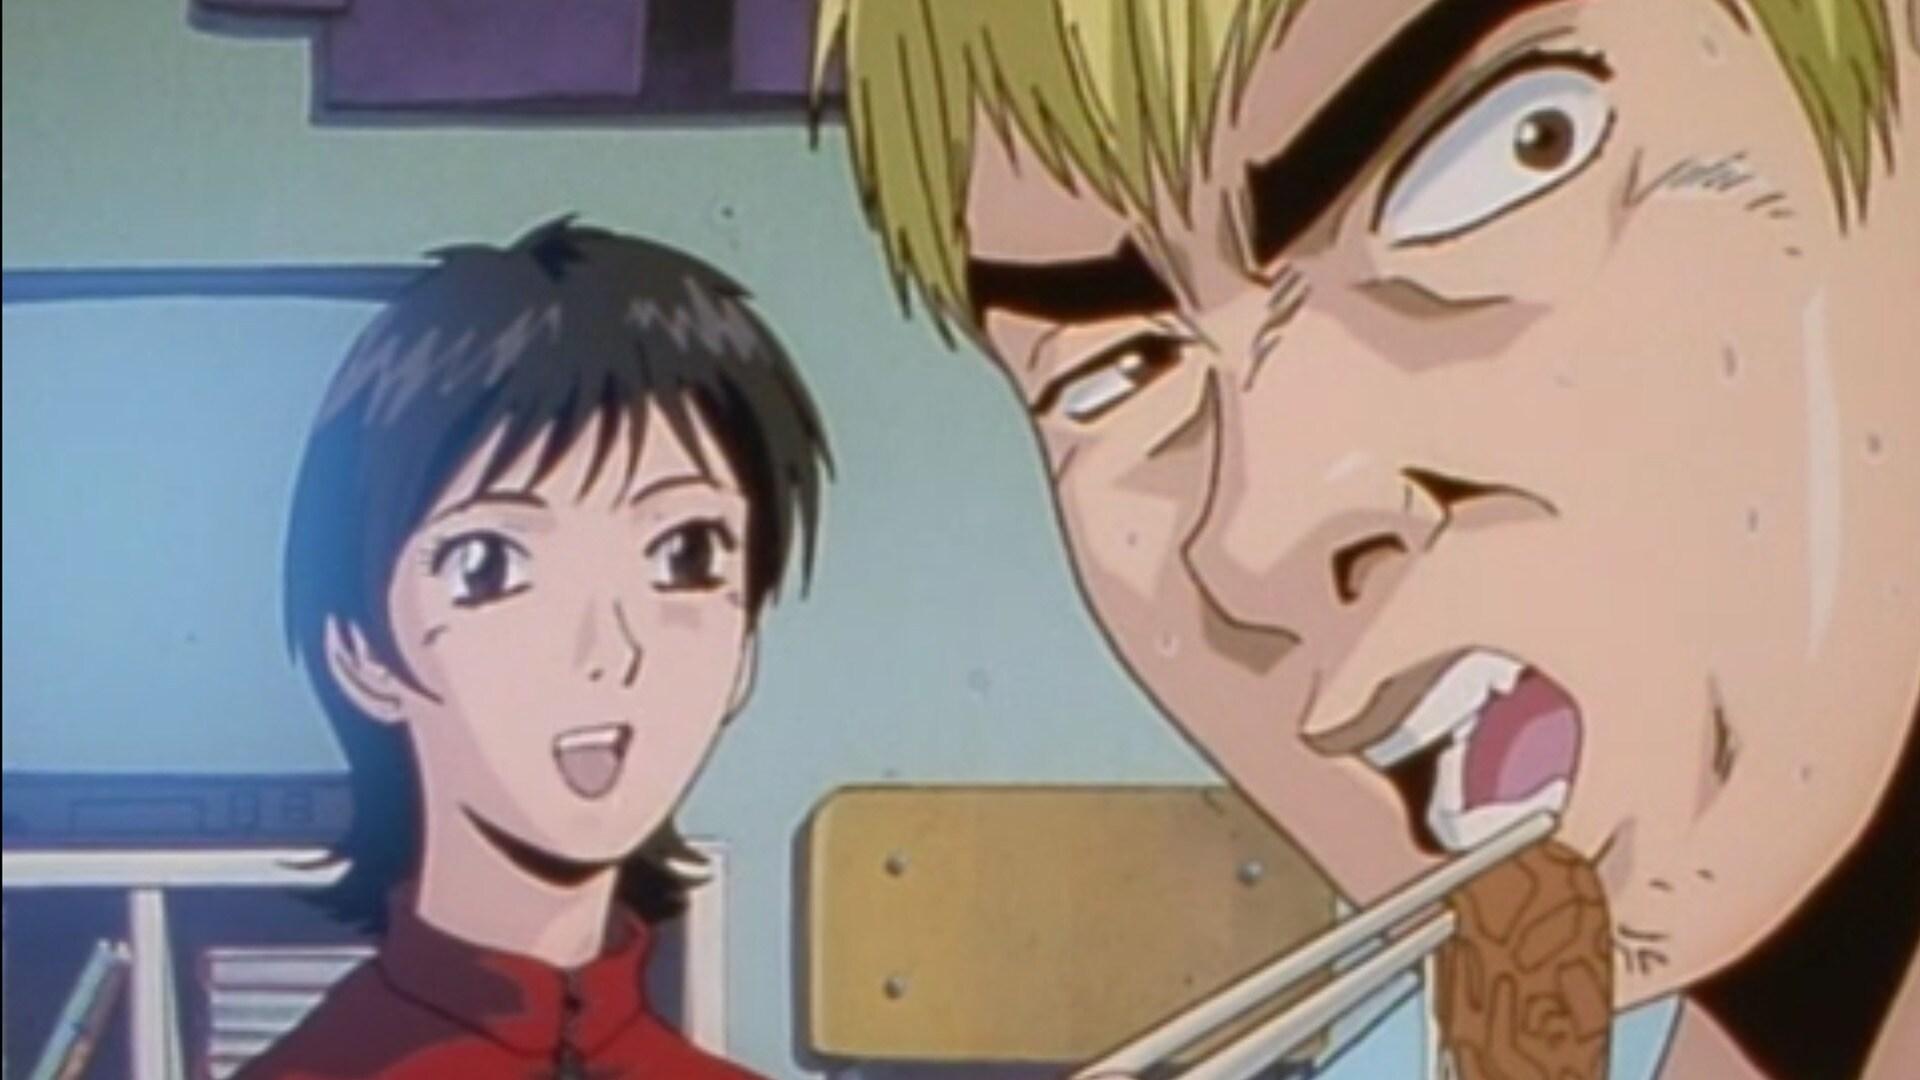 Onizuka Meets His Match